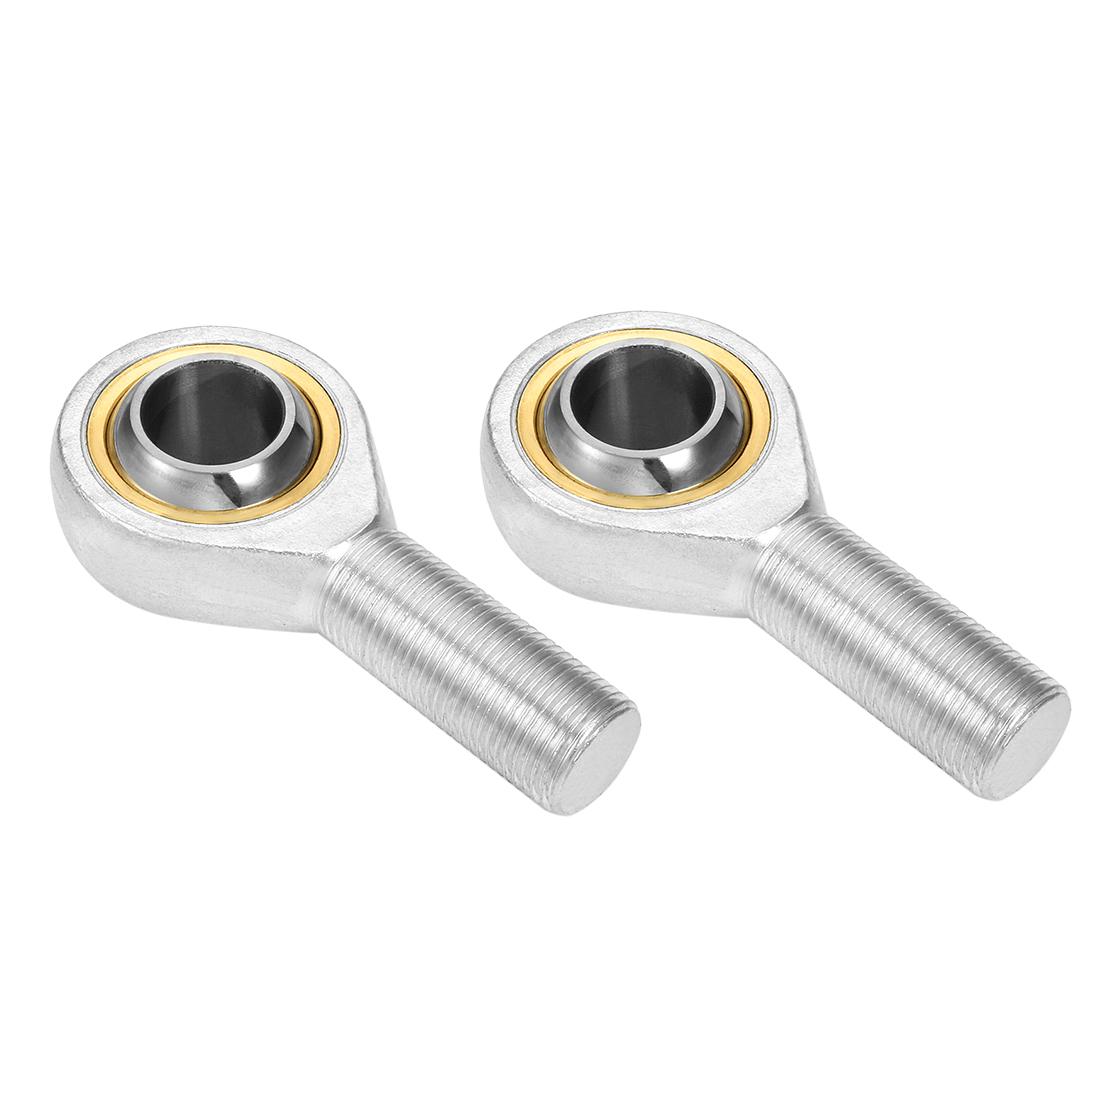 SA5T/K 5mm Bore Self Lubricating Male Right Hand Rod End Ball Bearing 2pcs